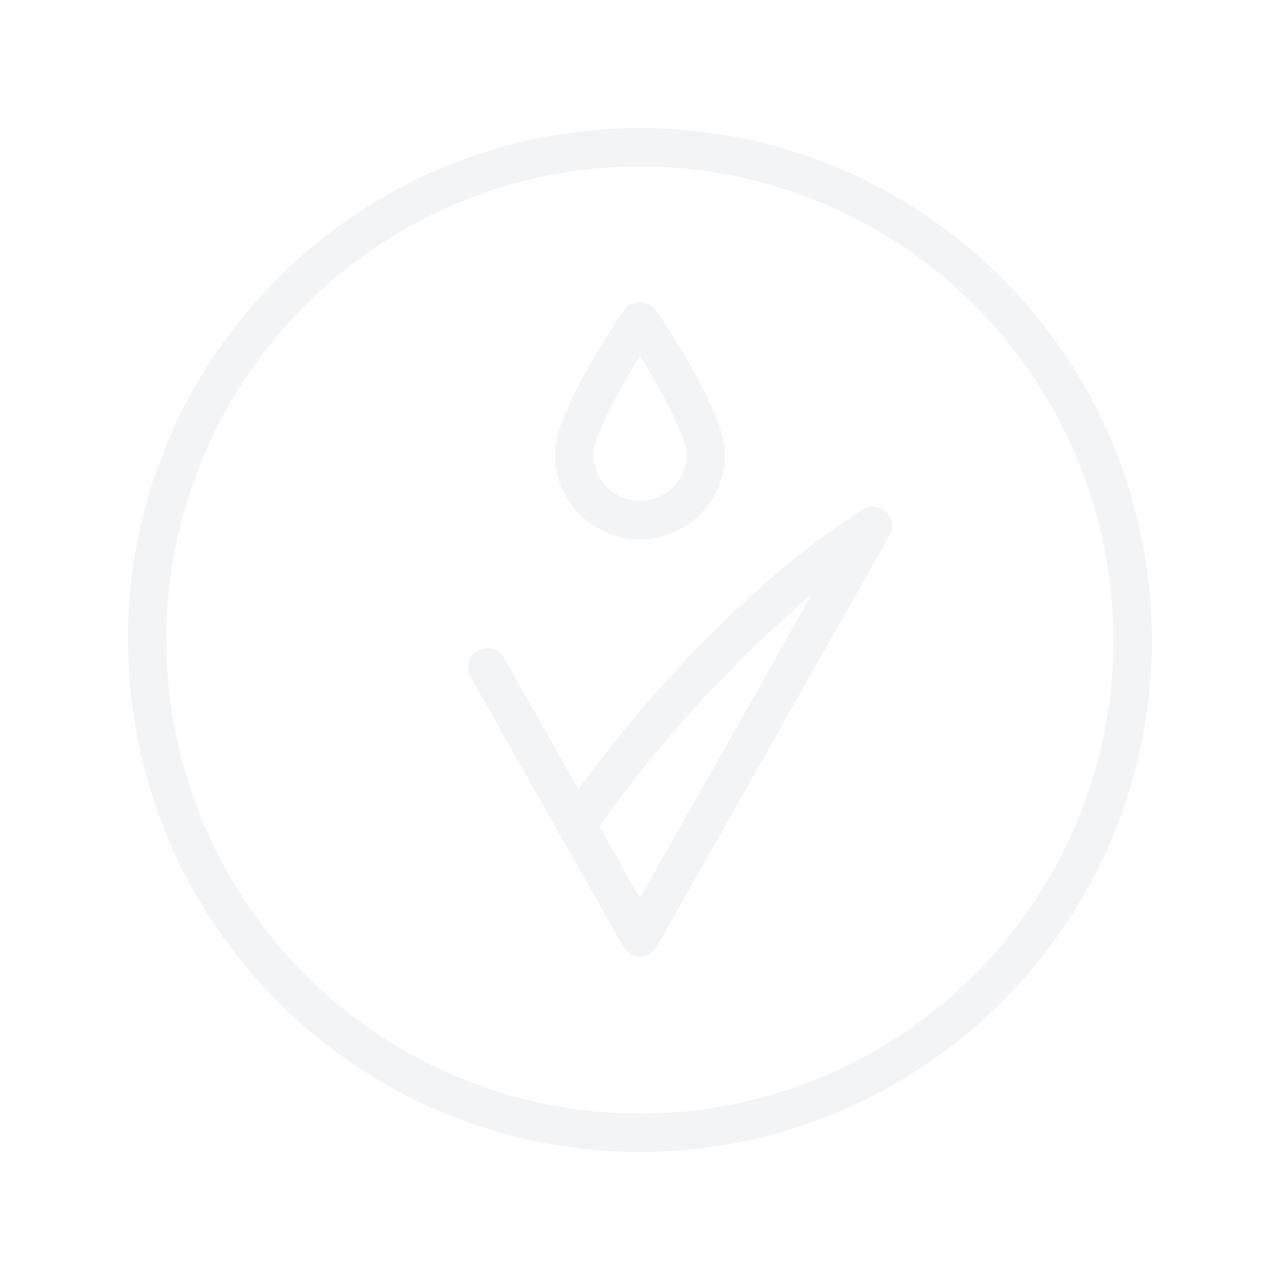 L'OREAL Infaillible Blush Paint Palette The Pinks 10g